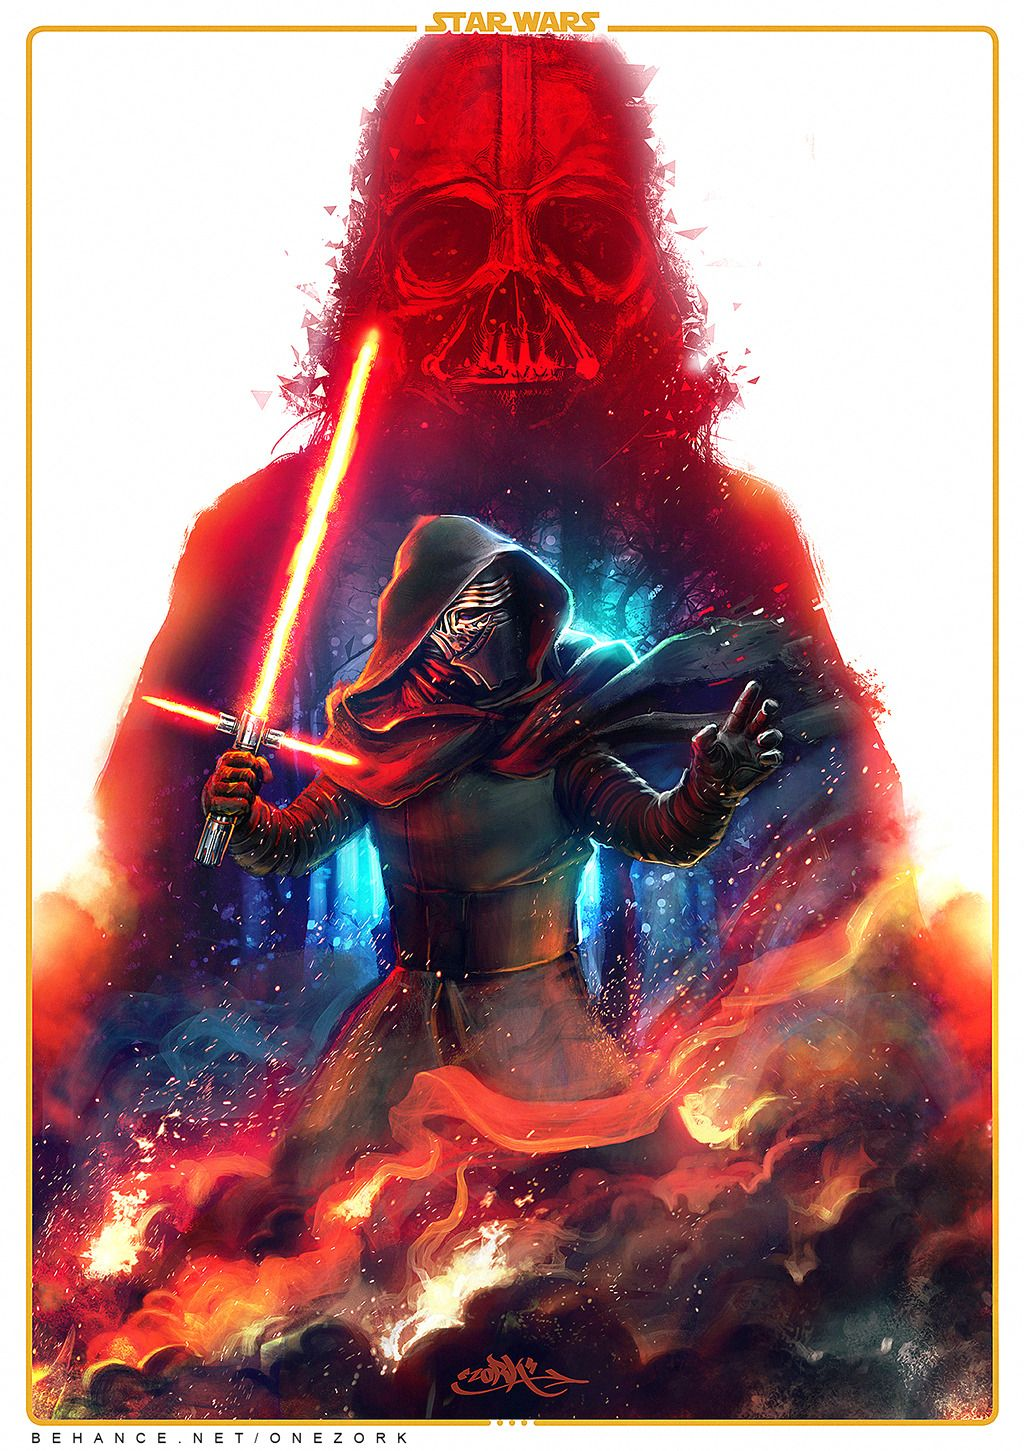 Star Wars The Force Awakens Created By Nestor Marinero Cervano